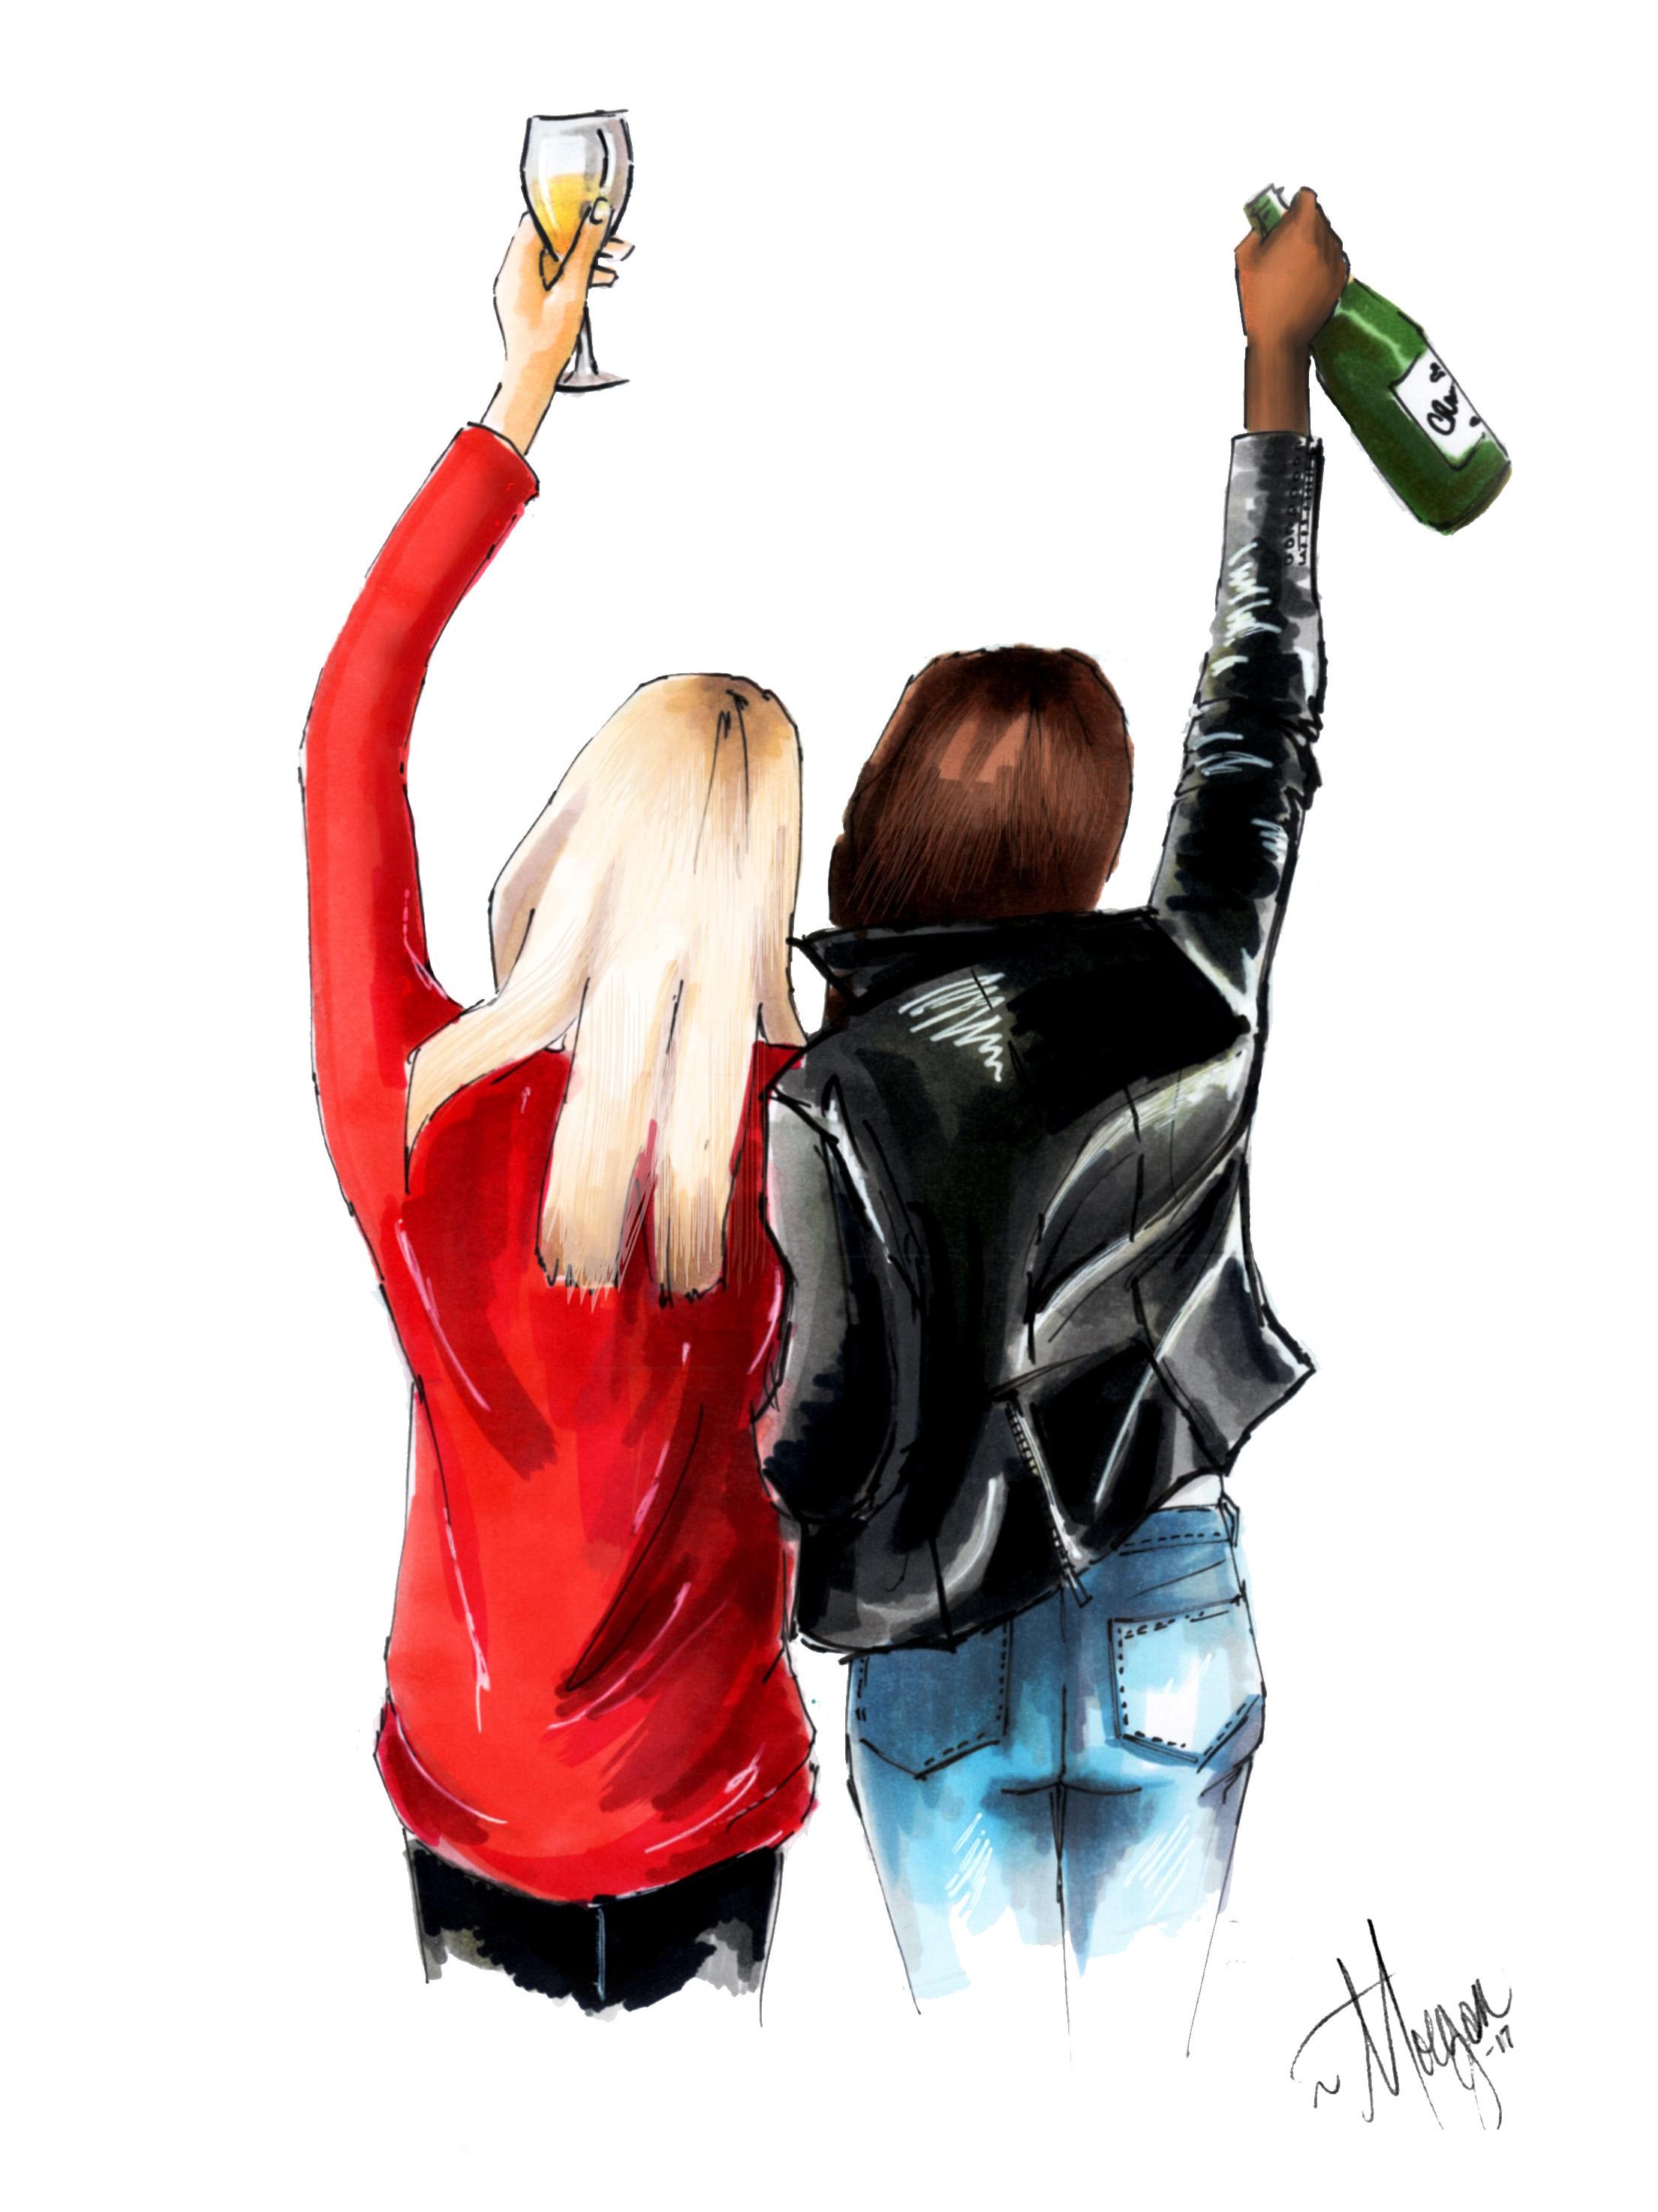 cheers-illustration-morgan-swank-studio.jpg